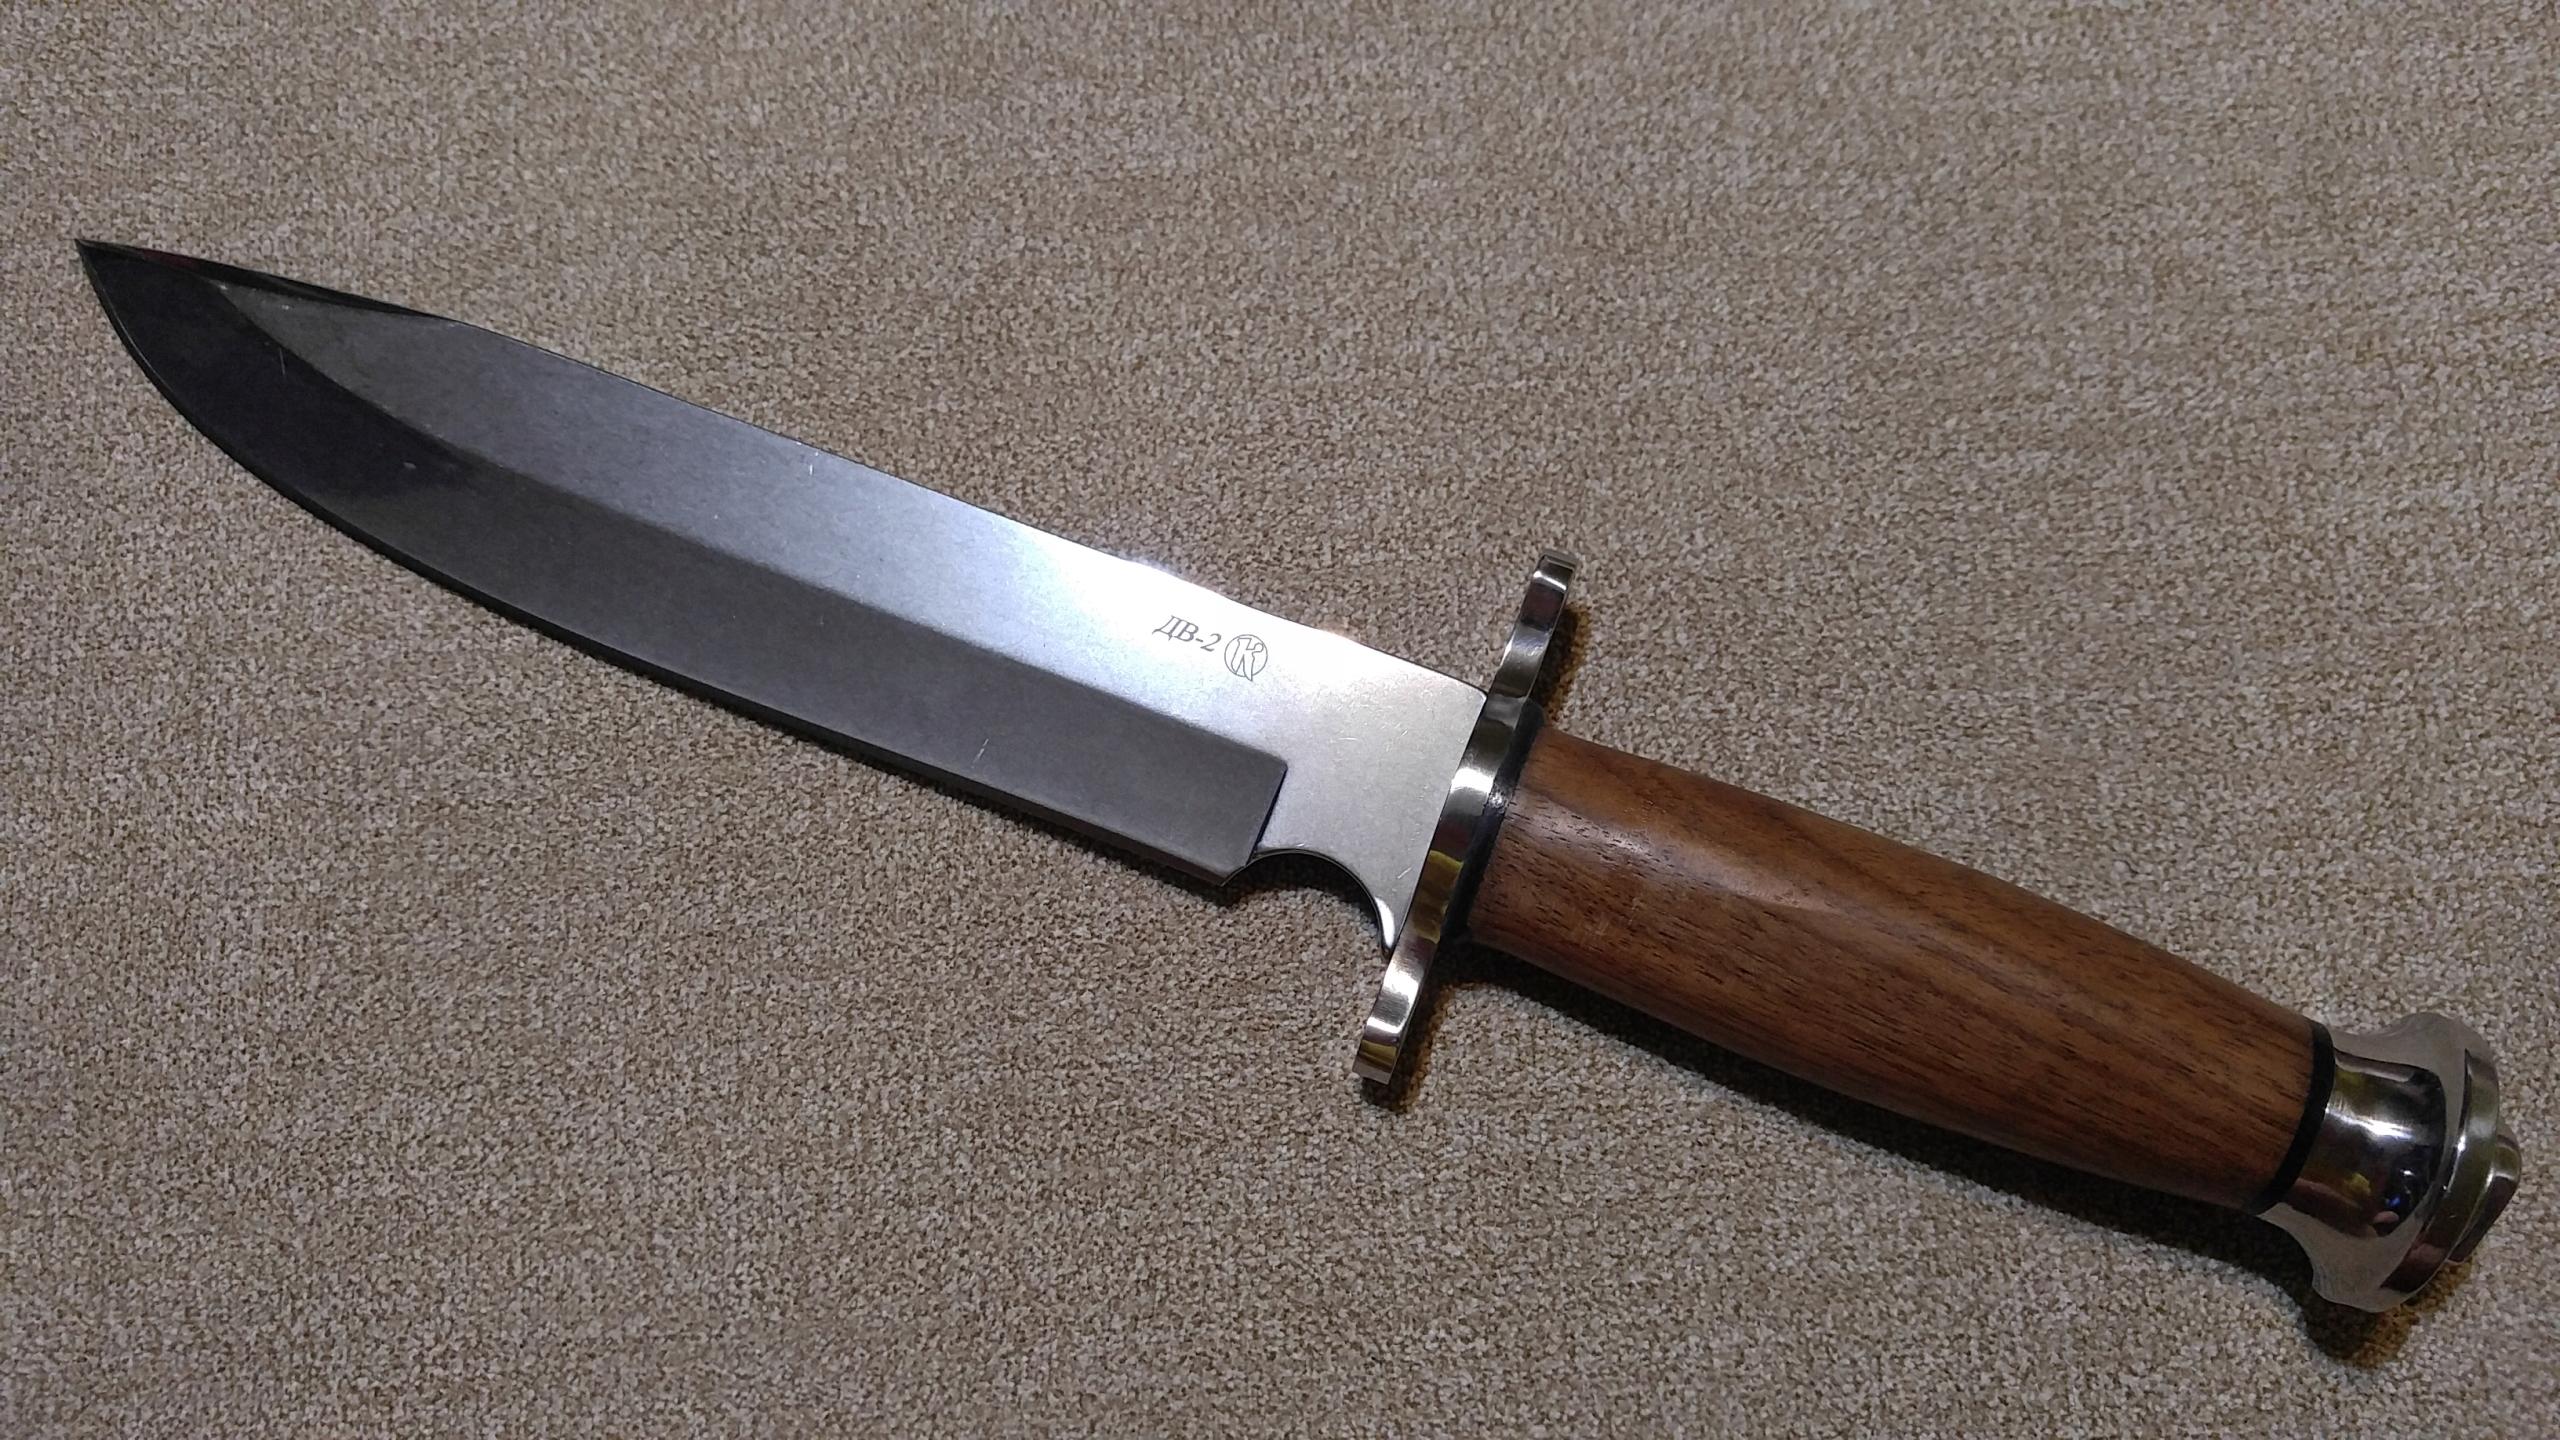 Rosyjski nóż bojowy Kizlyar DV 2, AUS 8